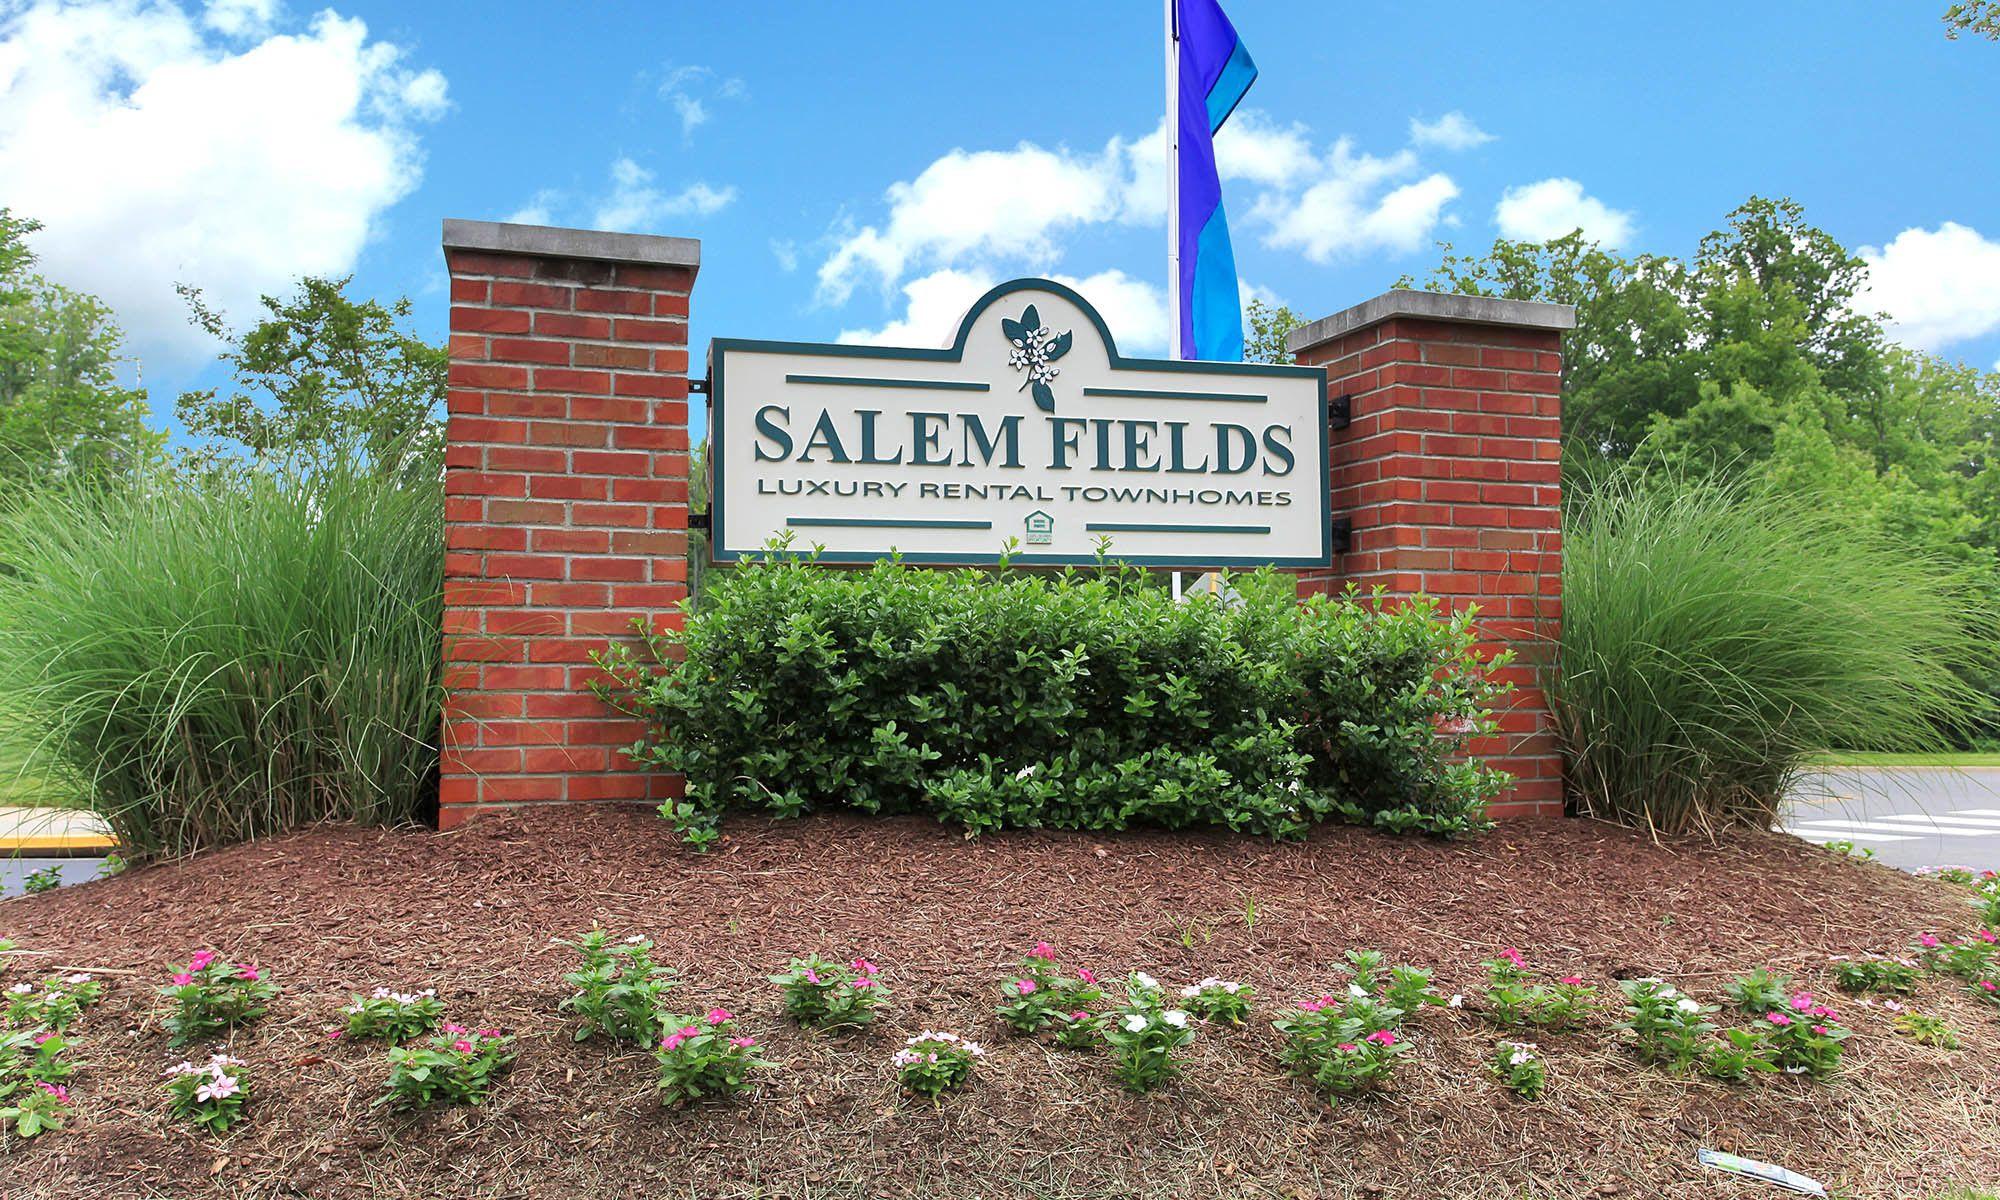 Signage at Salem Fields in Fredericksburg